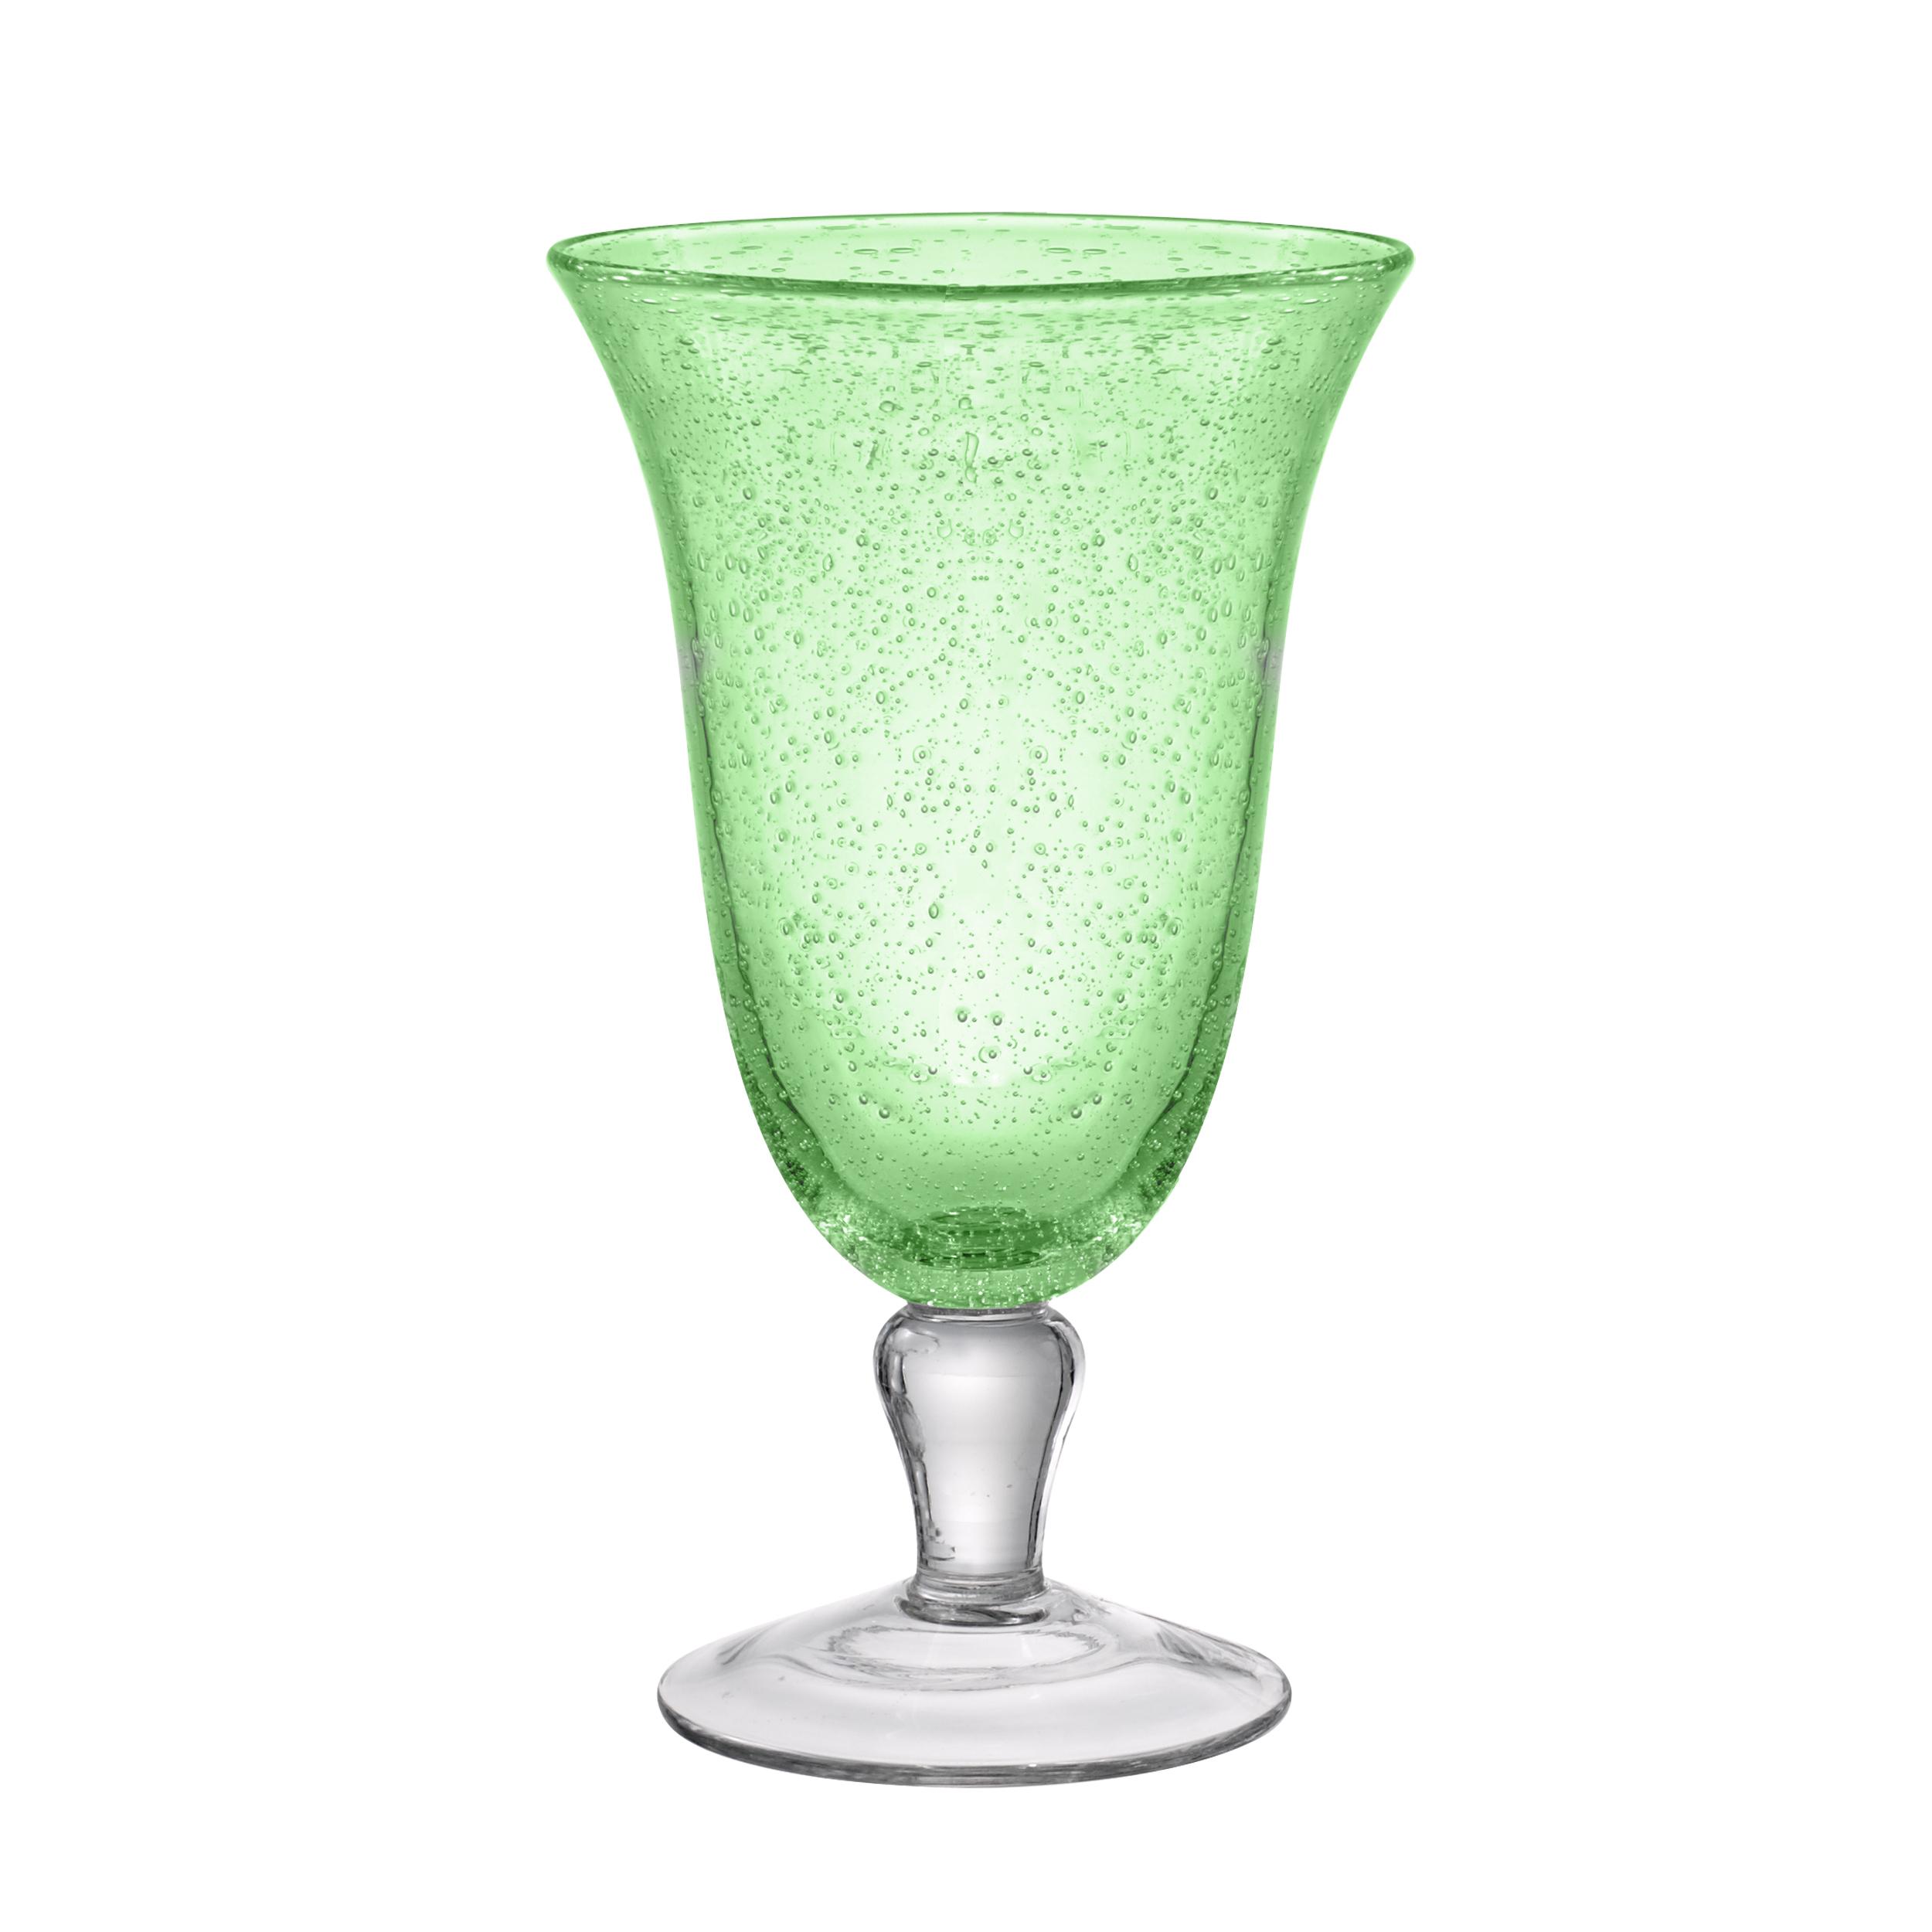 Artland Iris Light Green 18 Ounce Footed Iced Tea Glass